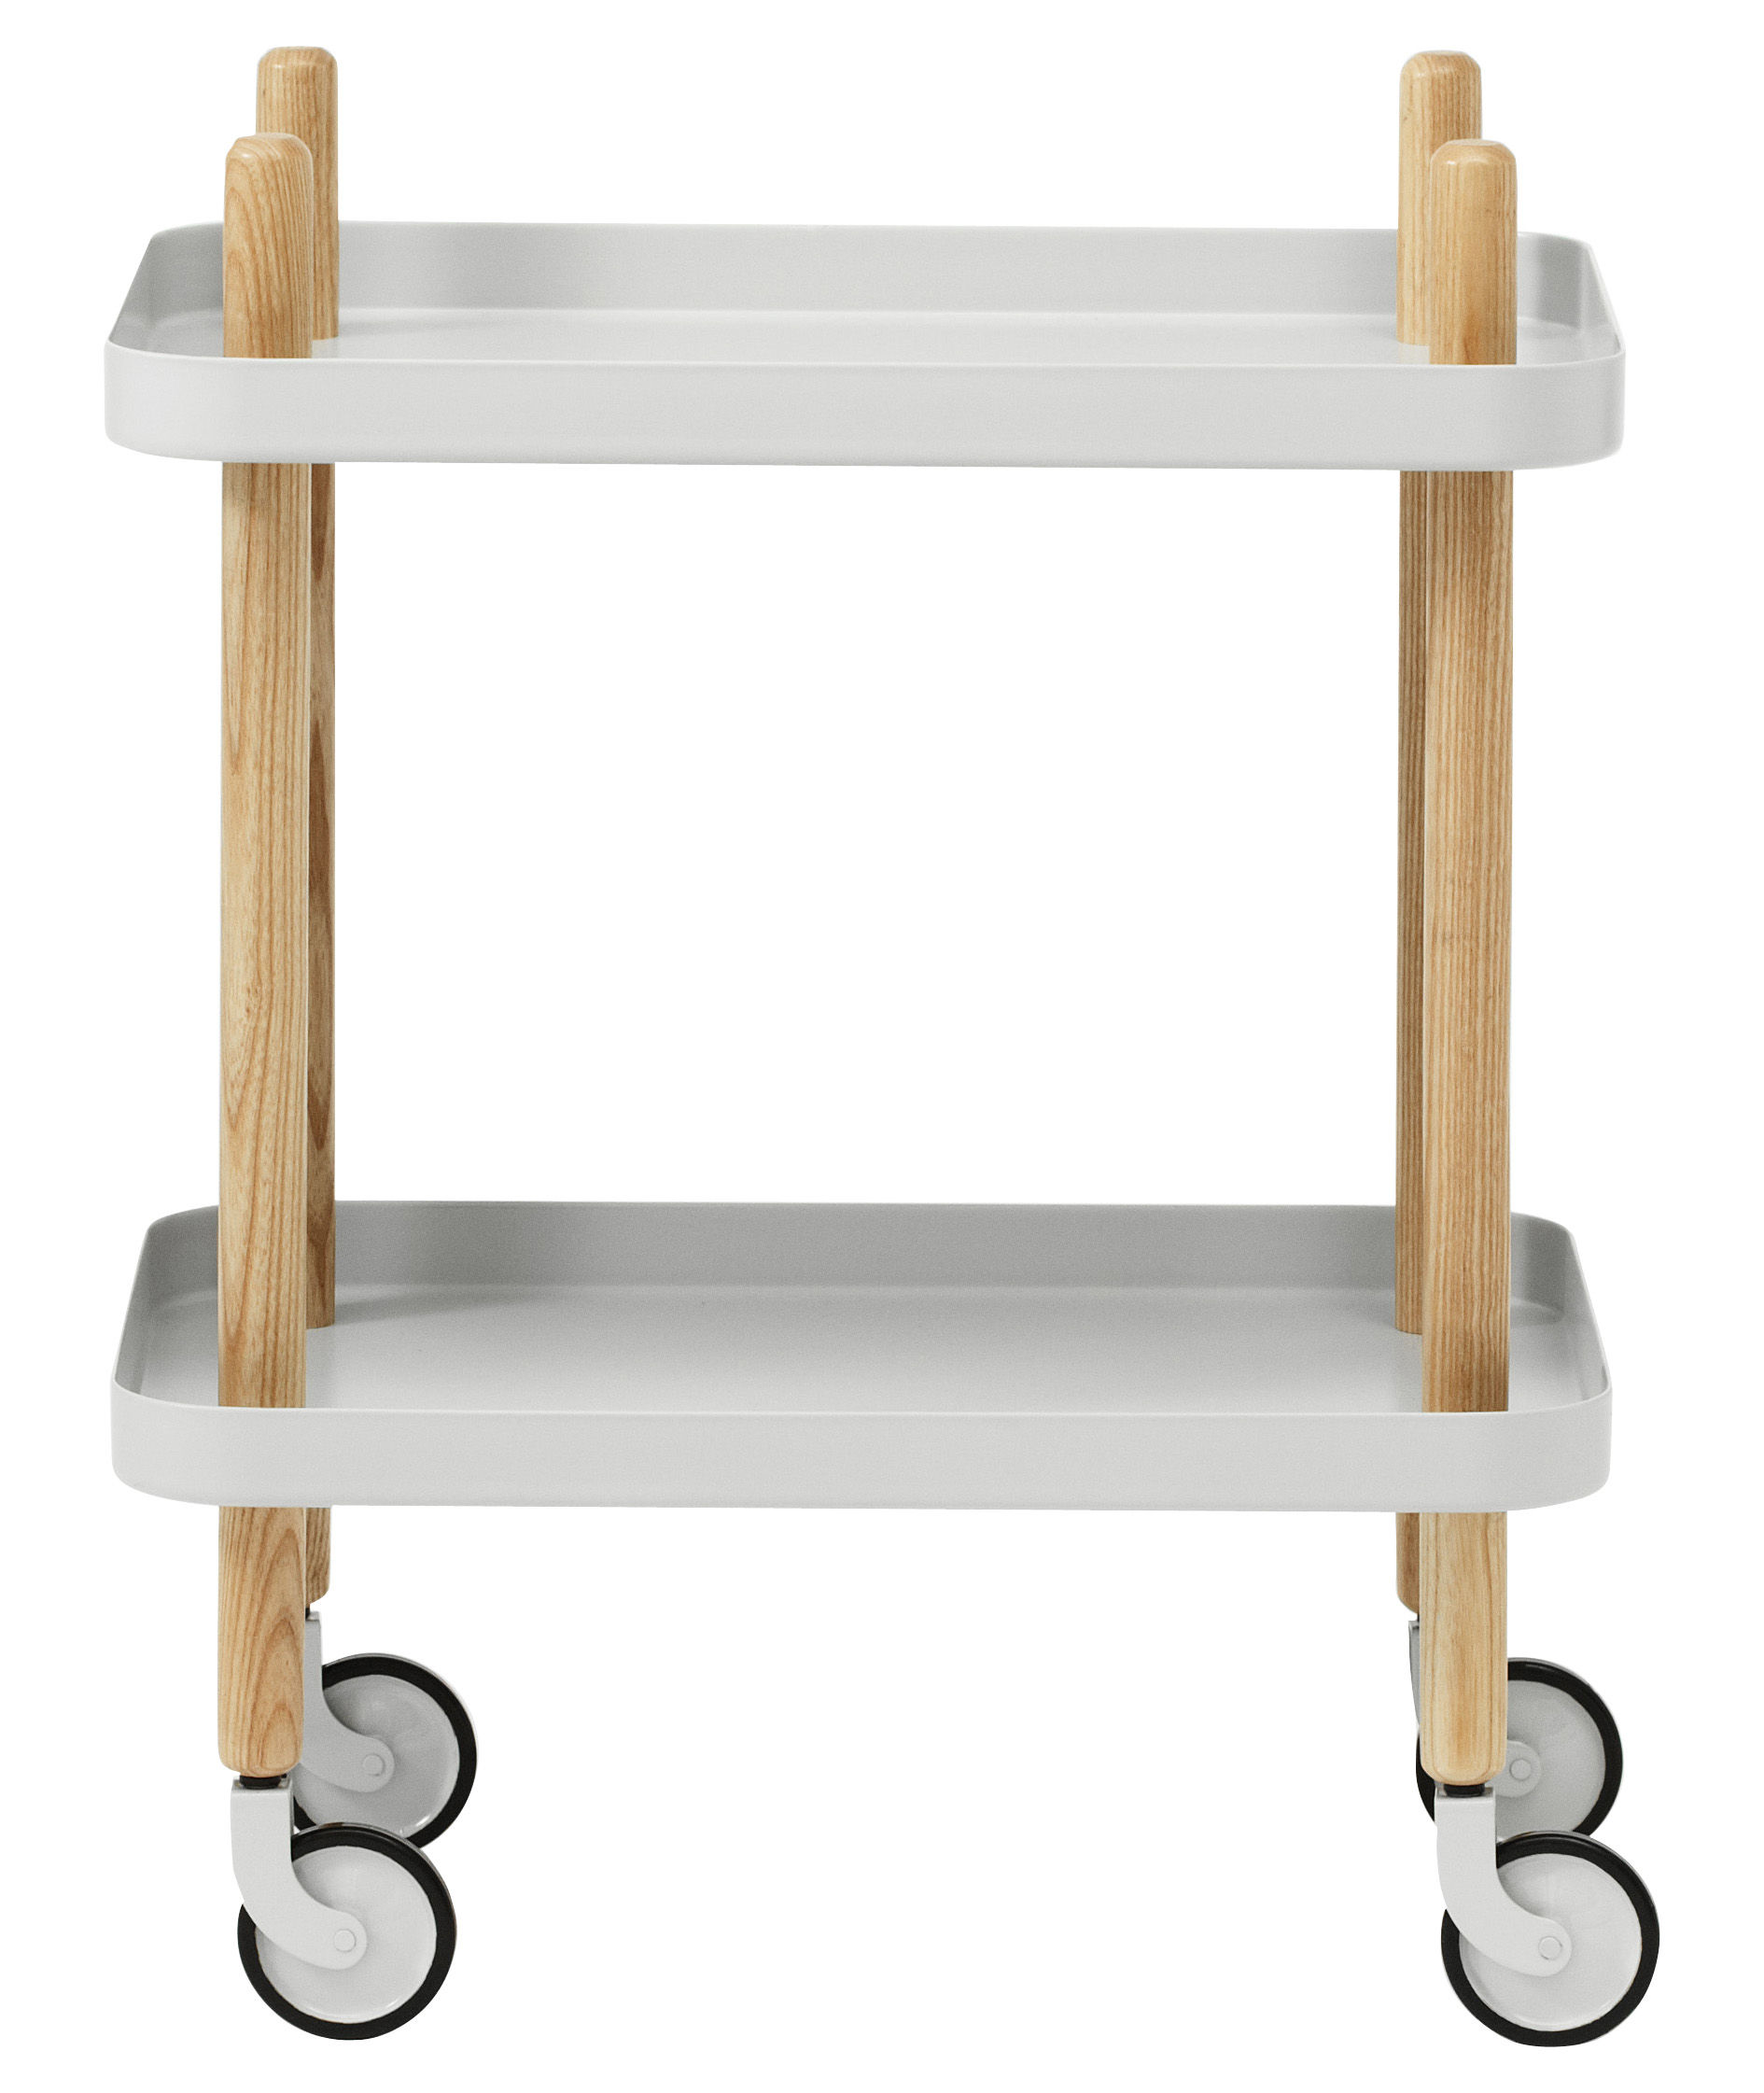 Furniture - Miscellaneous furniture - Block Dresser - On wheels by Normann Copenhagen - Light grey - Ashwood, Steel